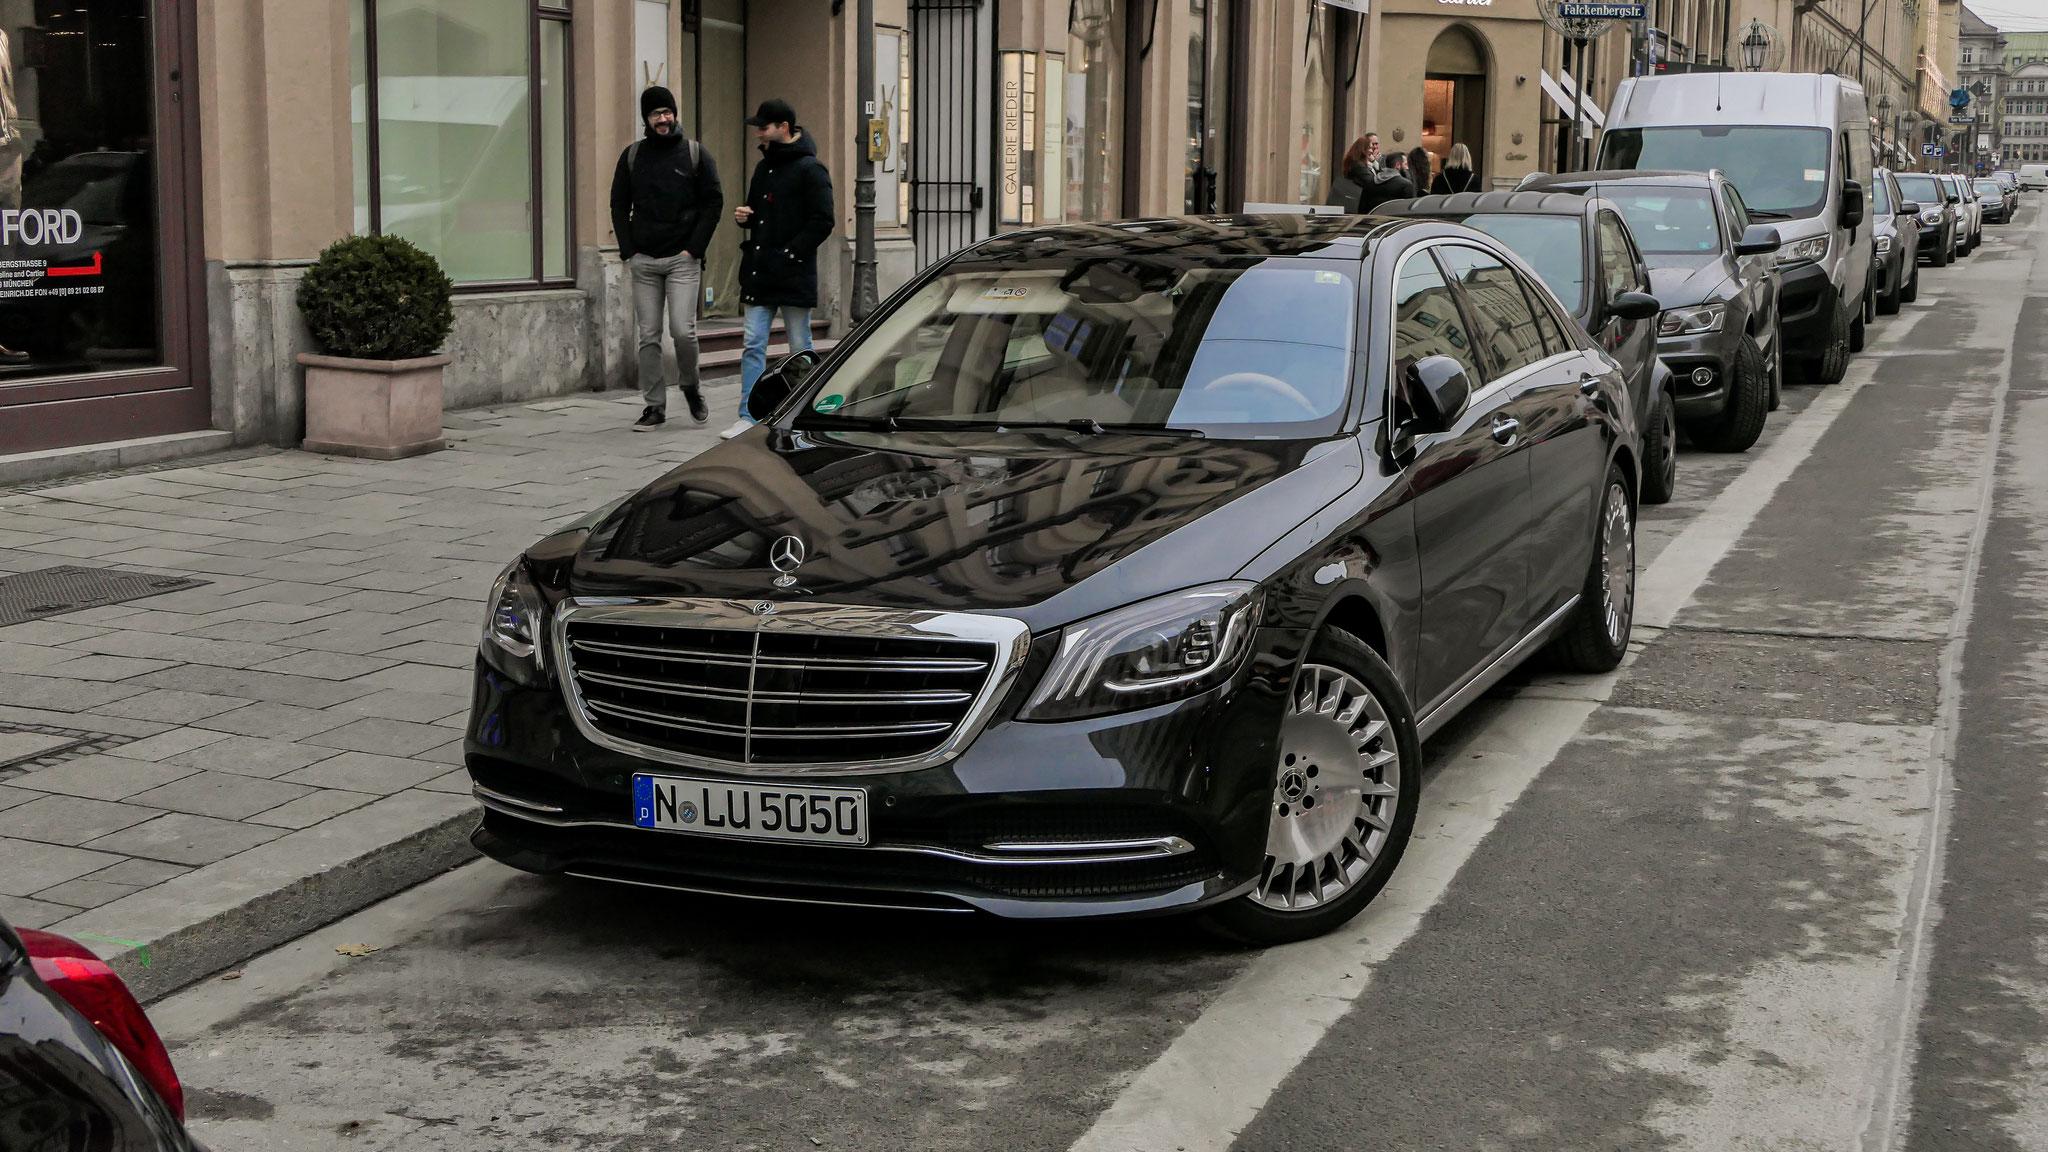 Mercedes Maybach S500 - N-LU-5050